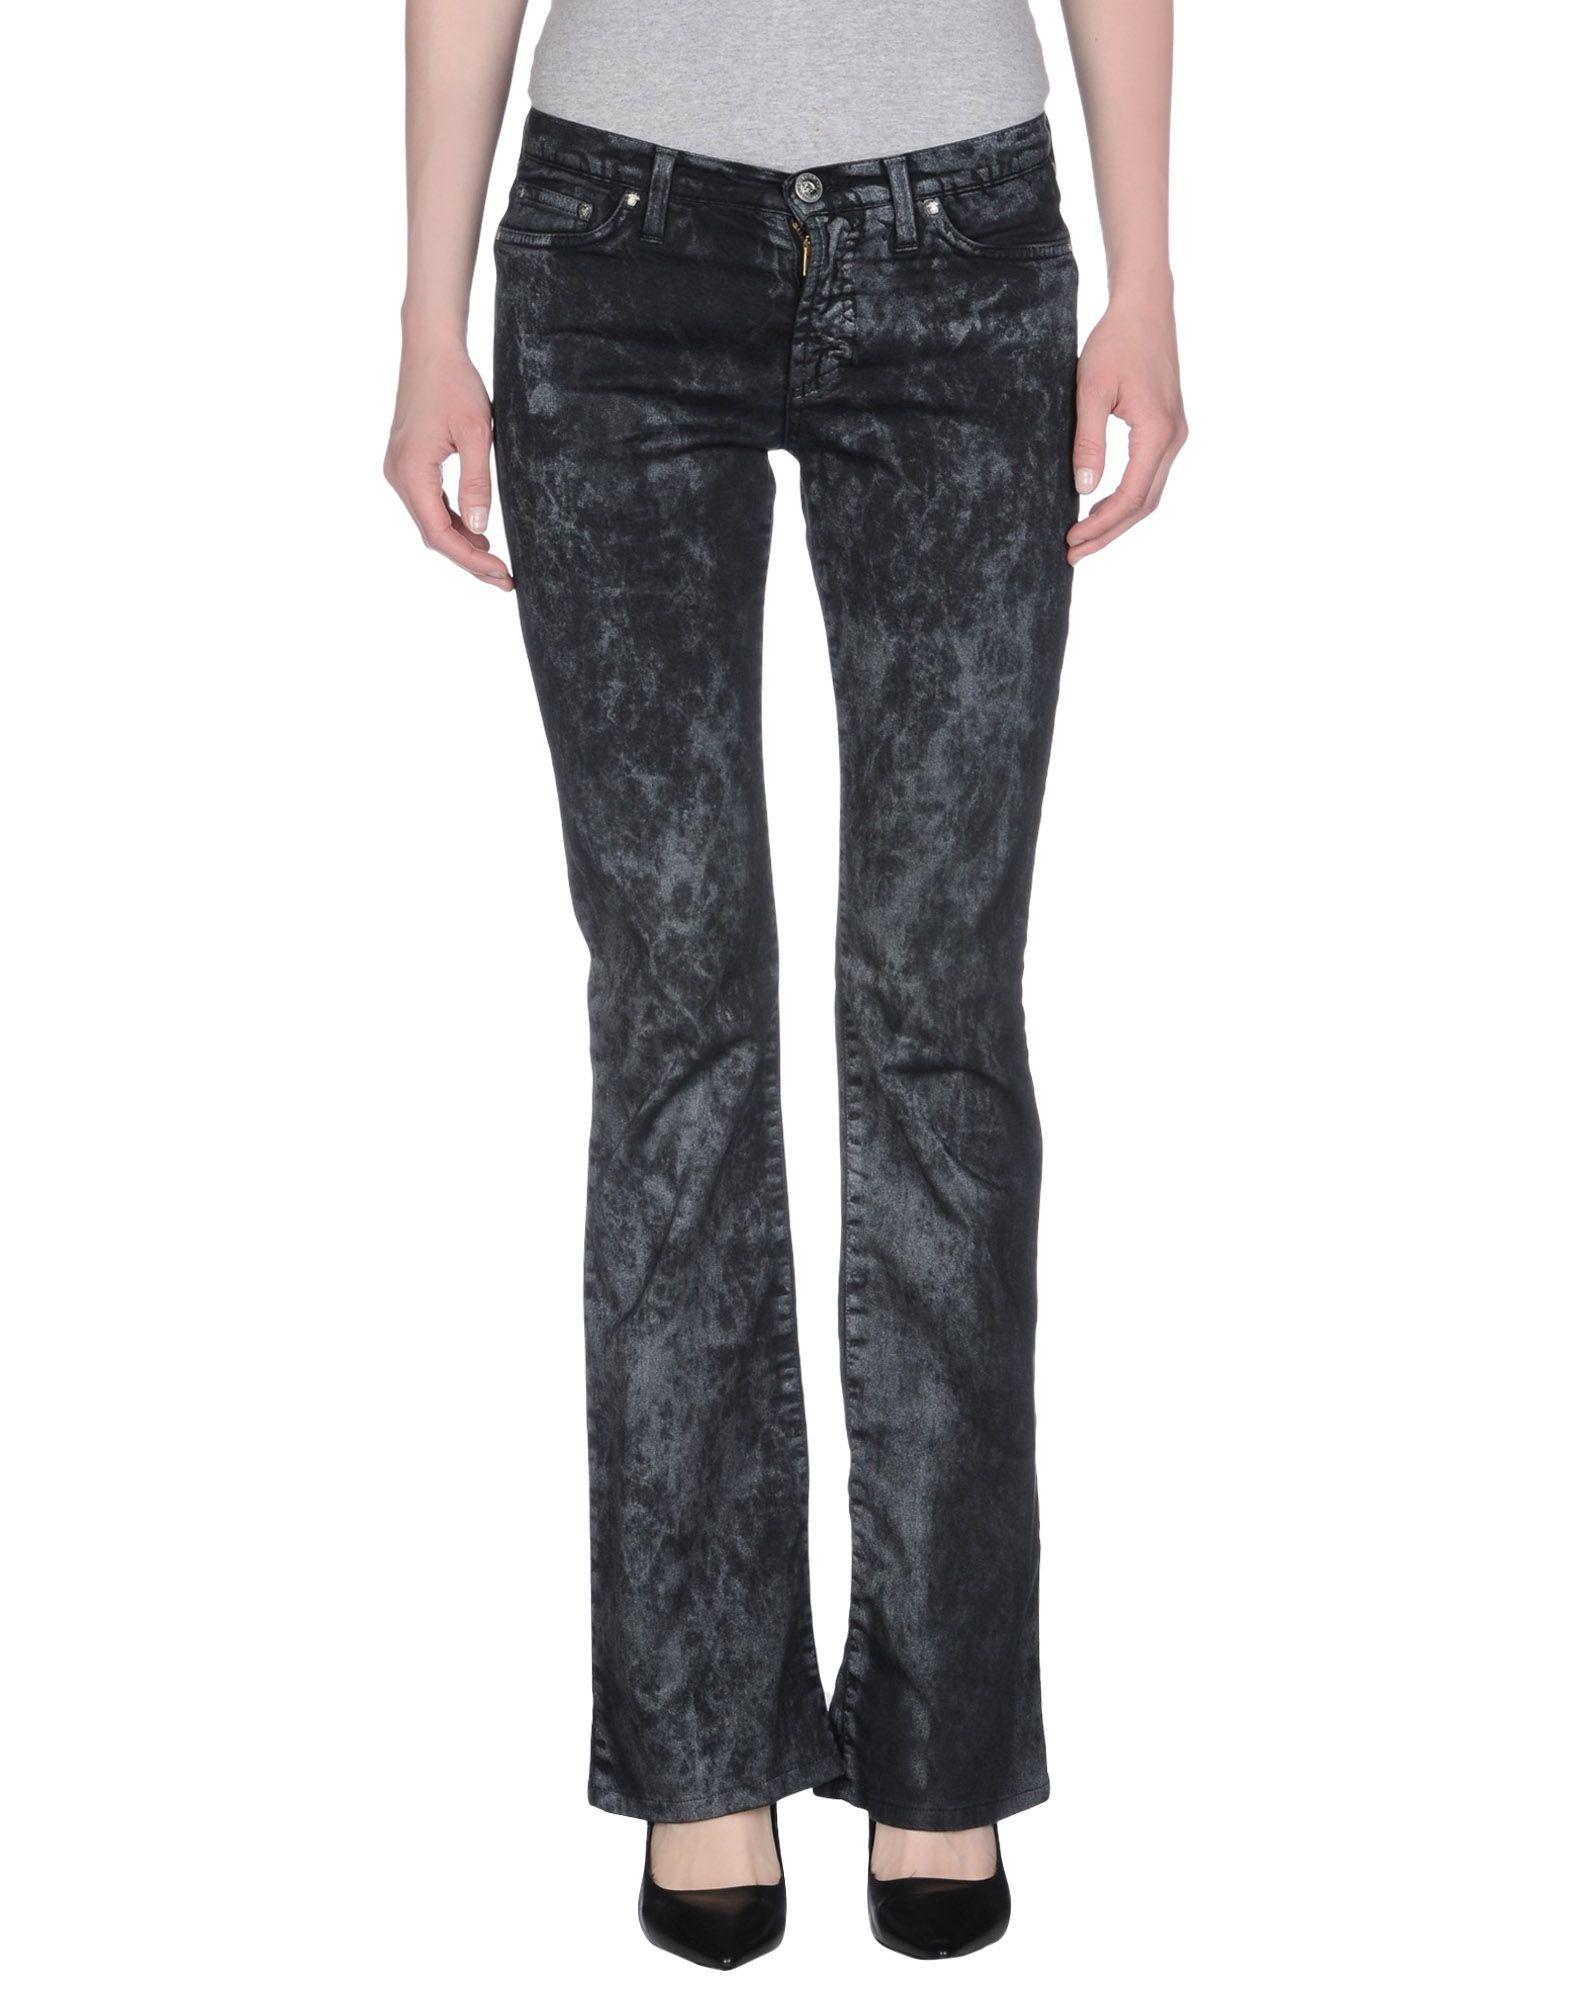 Elegant Versace Jeans Women39s Black Casual Trouser